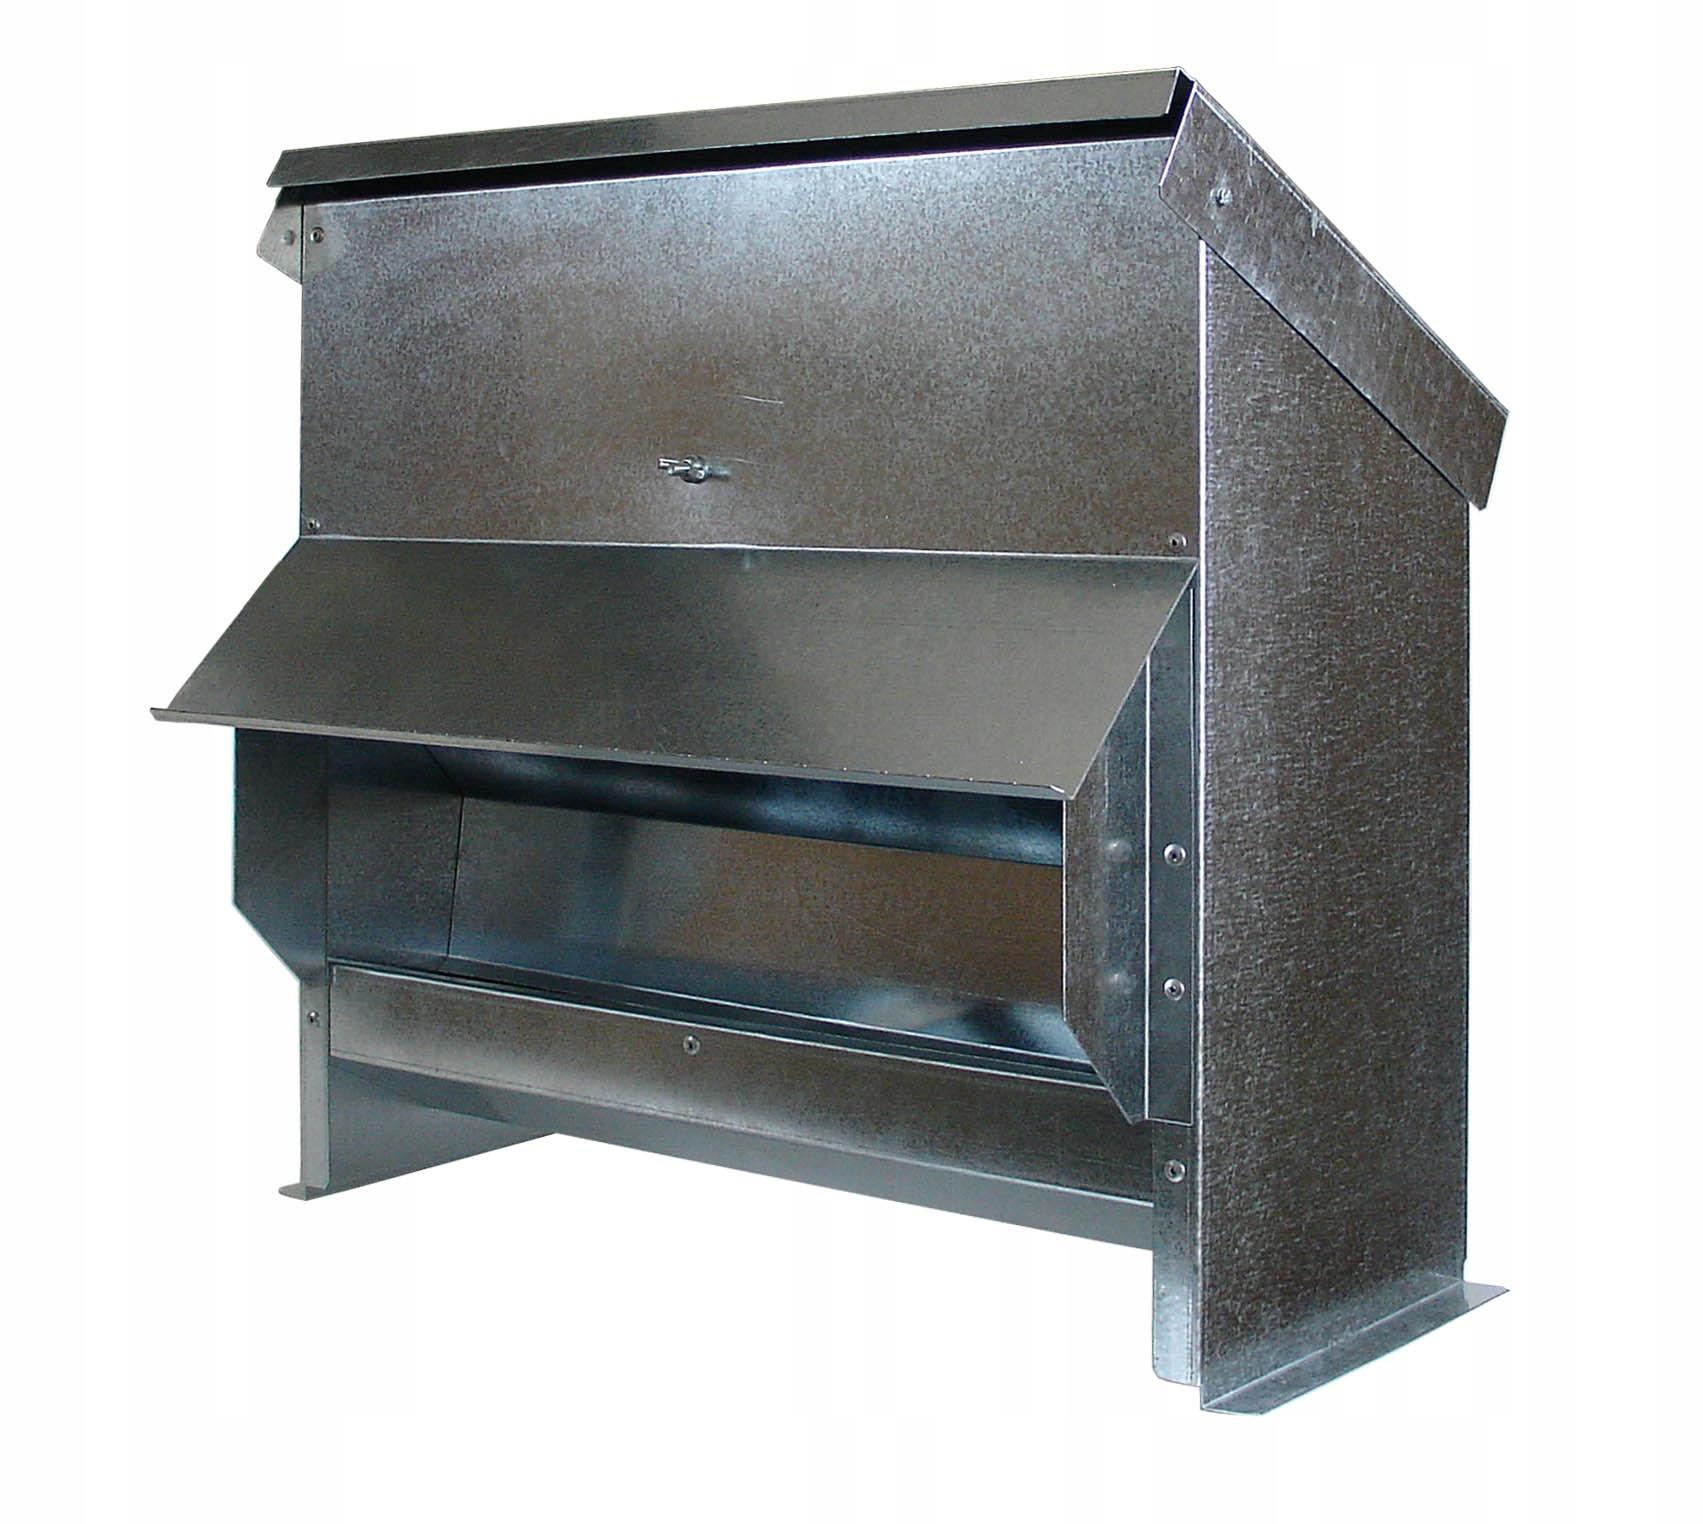 Лоток загрузочная дверца автоматическое 22 кг лоток для корма